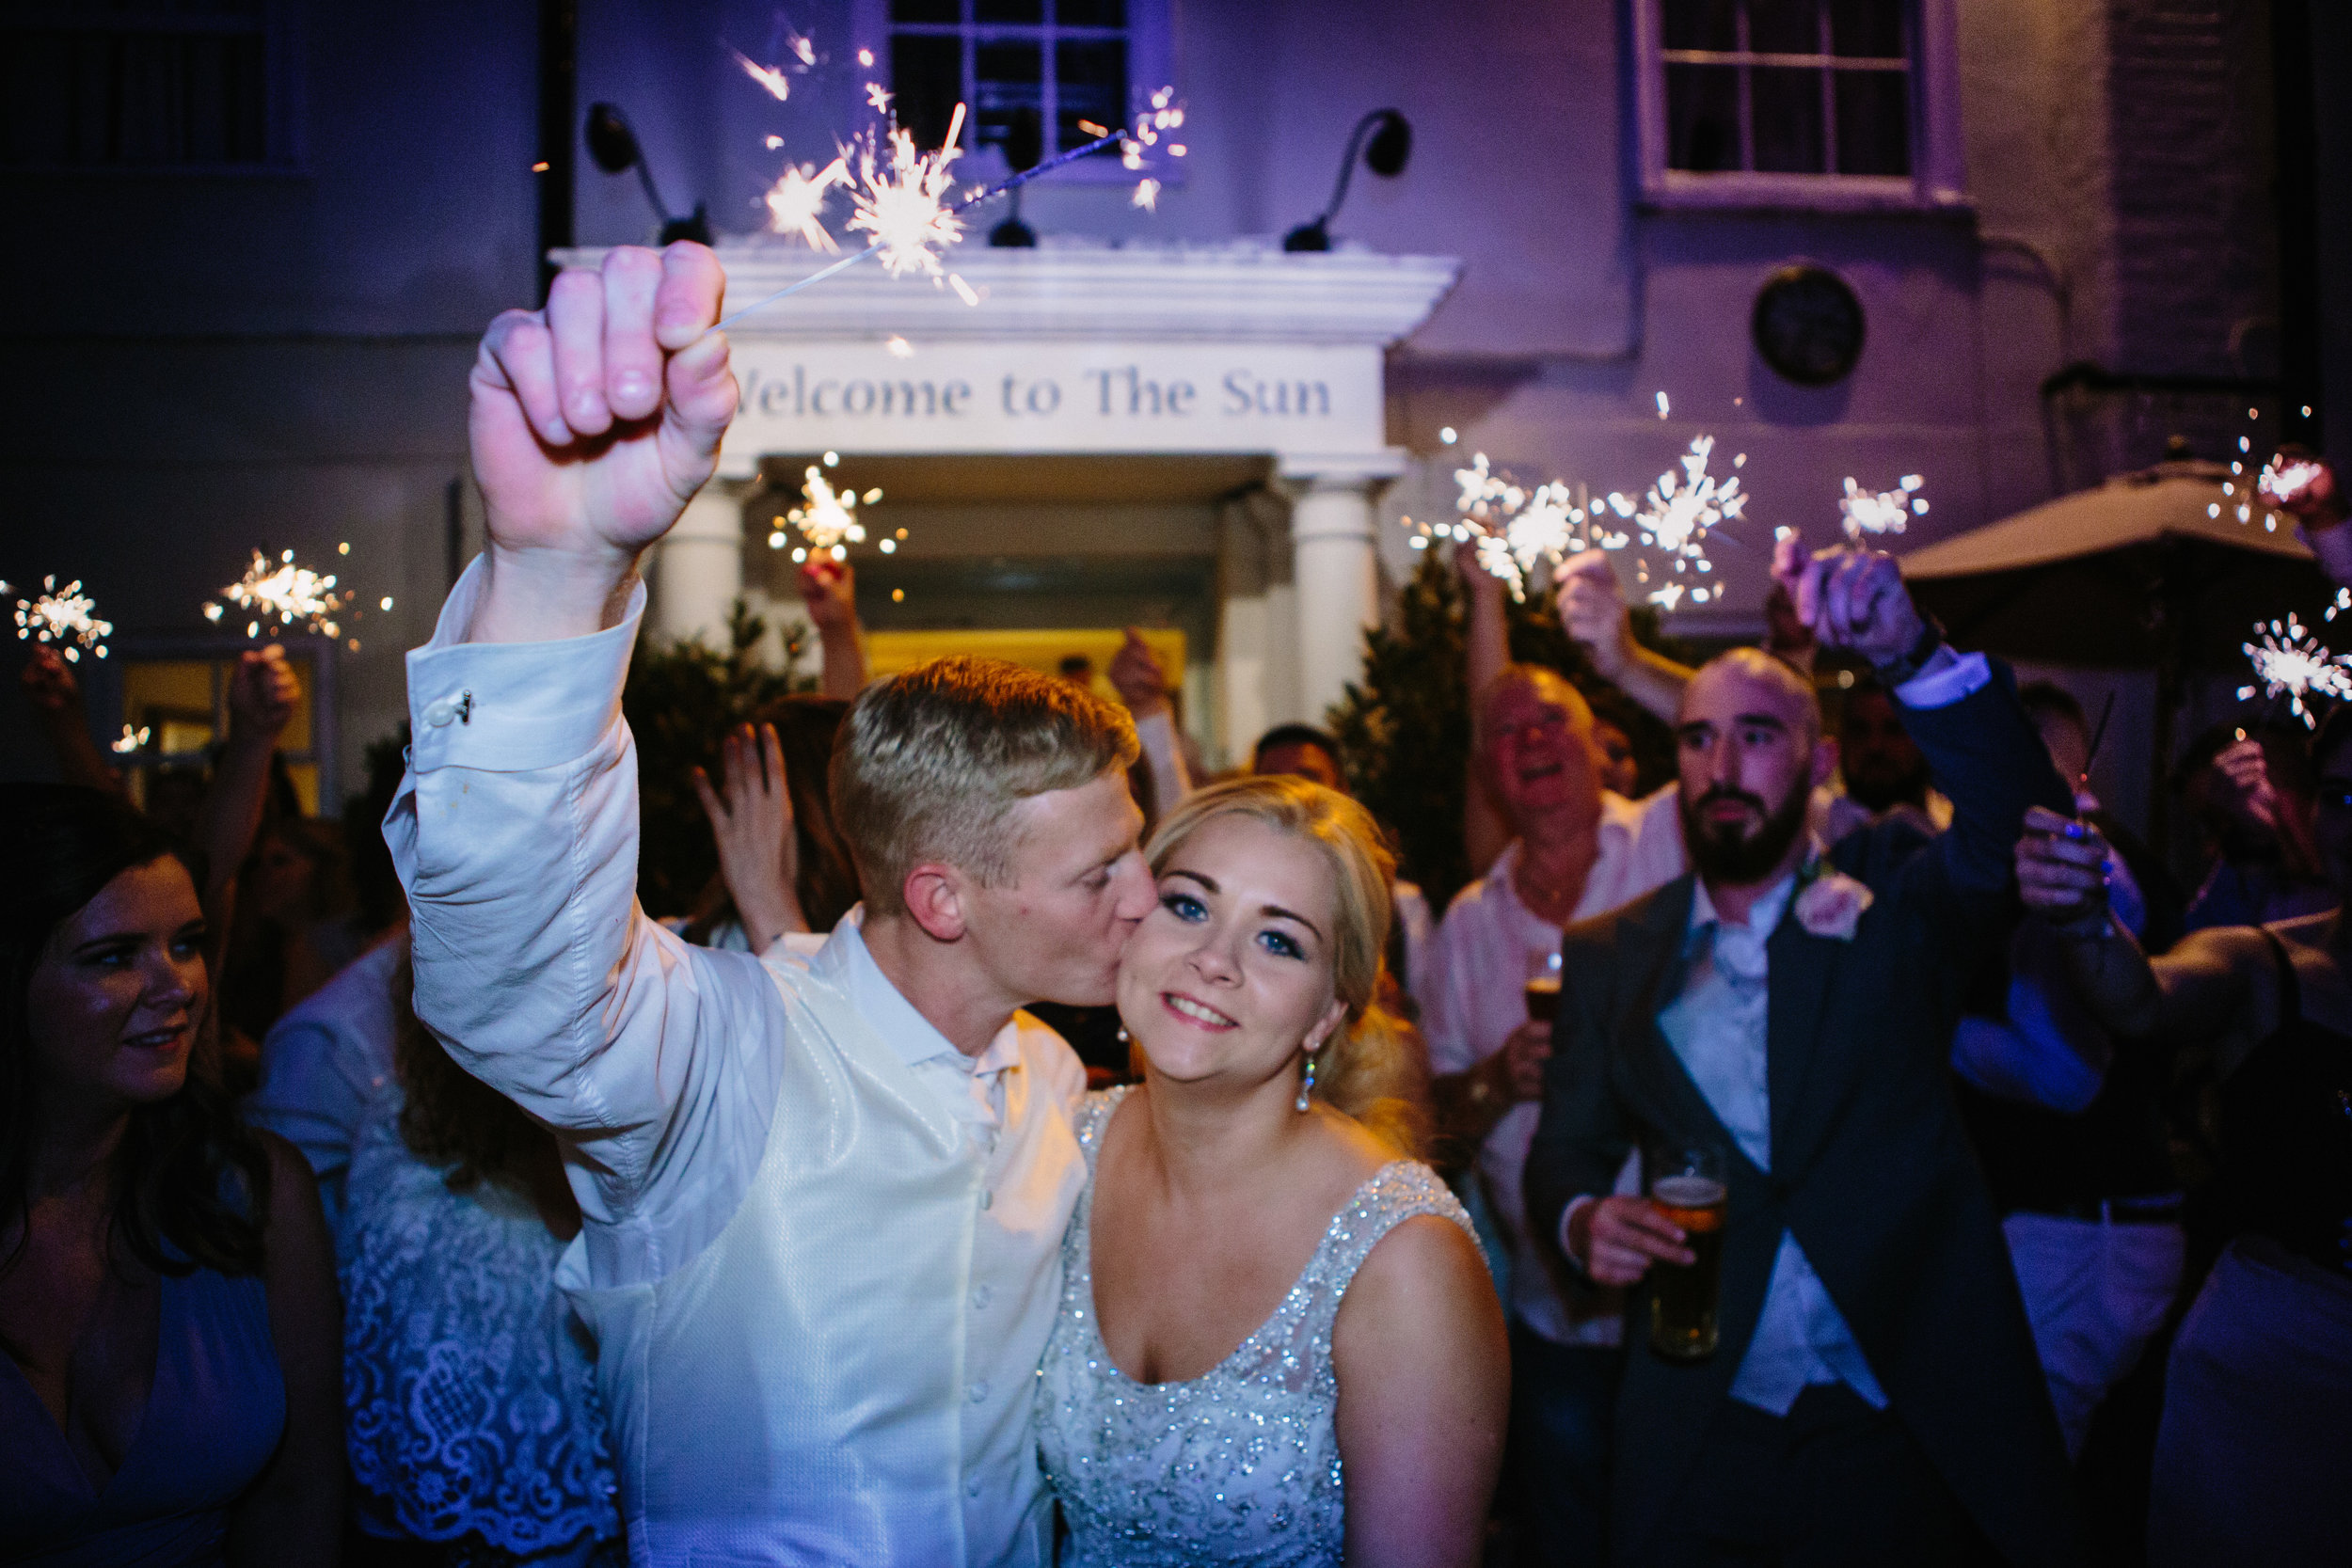 hitchin-hertfordshire-london-wedding-photography-catholic-church-sun-inn-sparklers-60